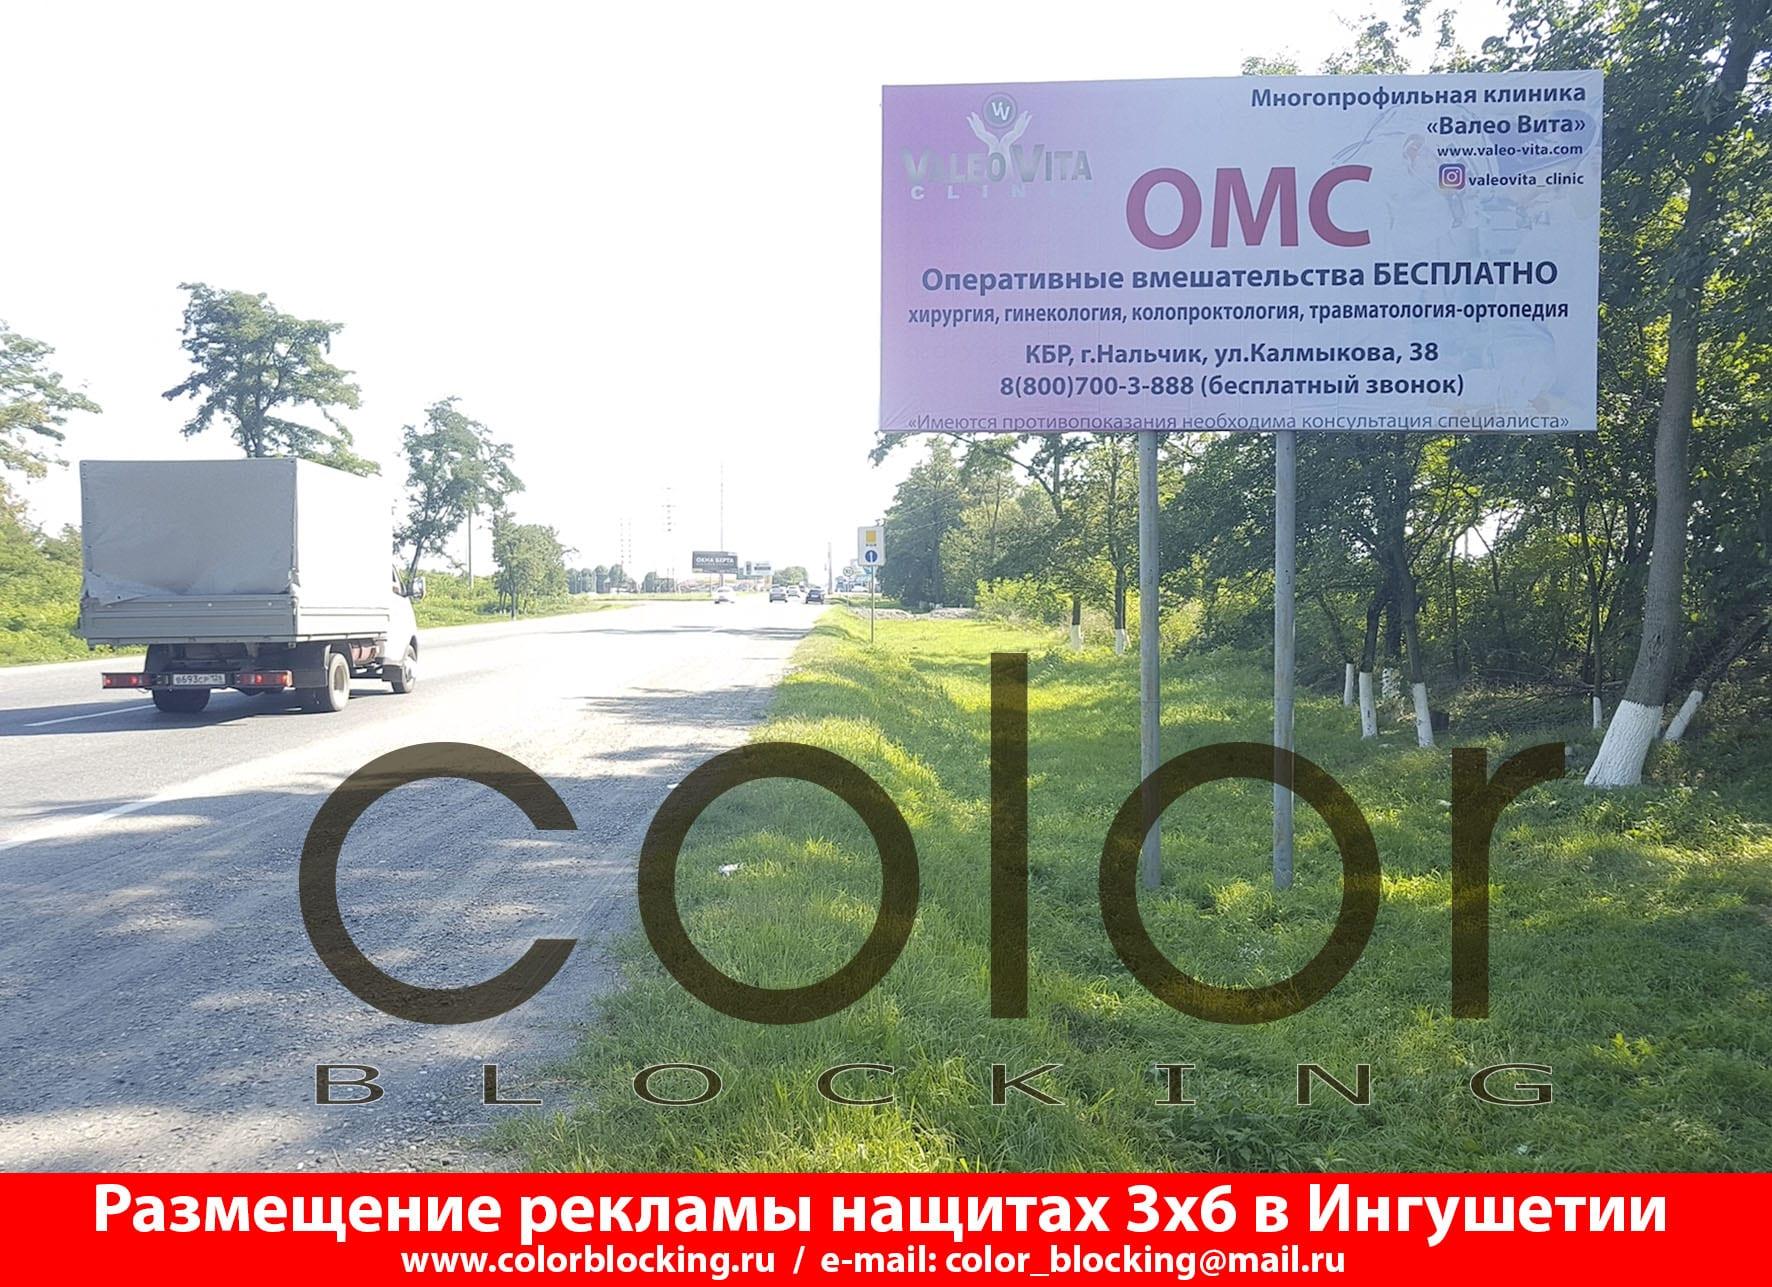 Реклама на щитах 3х6 в Ингушетии назрань